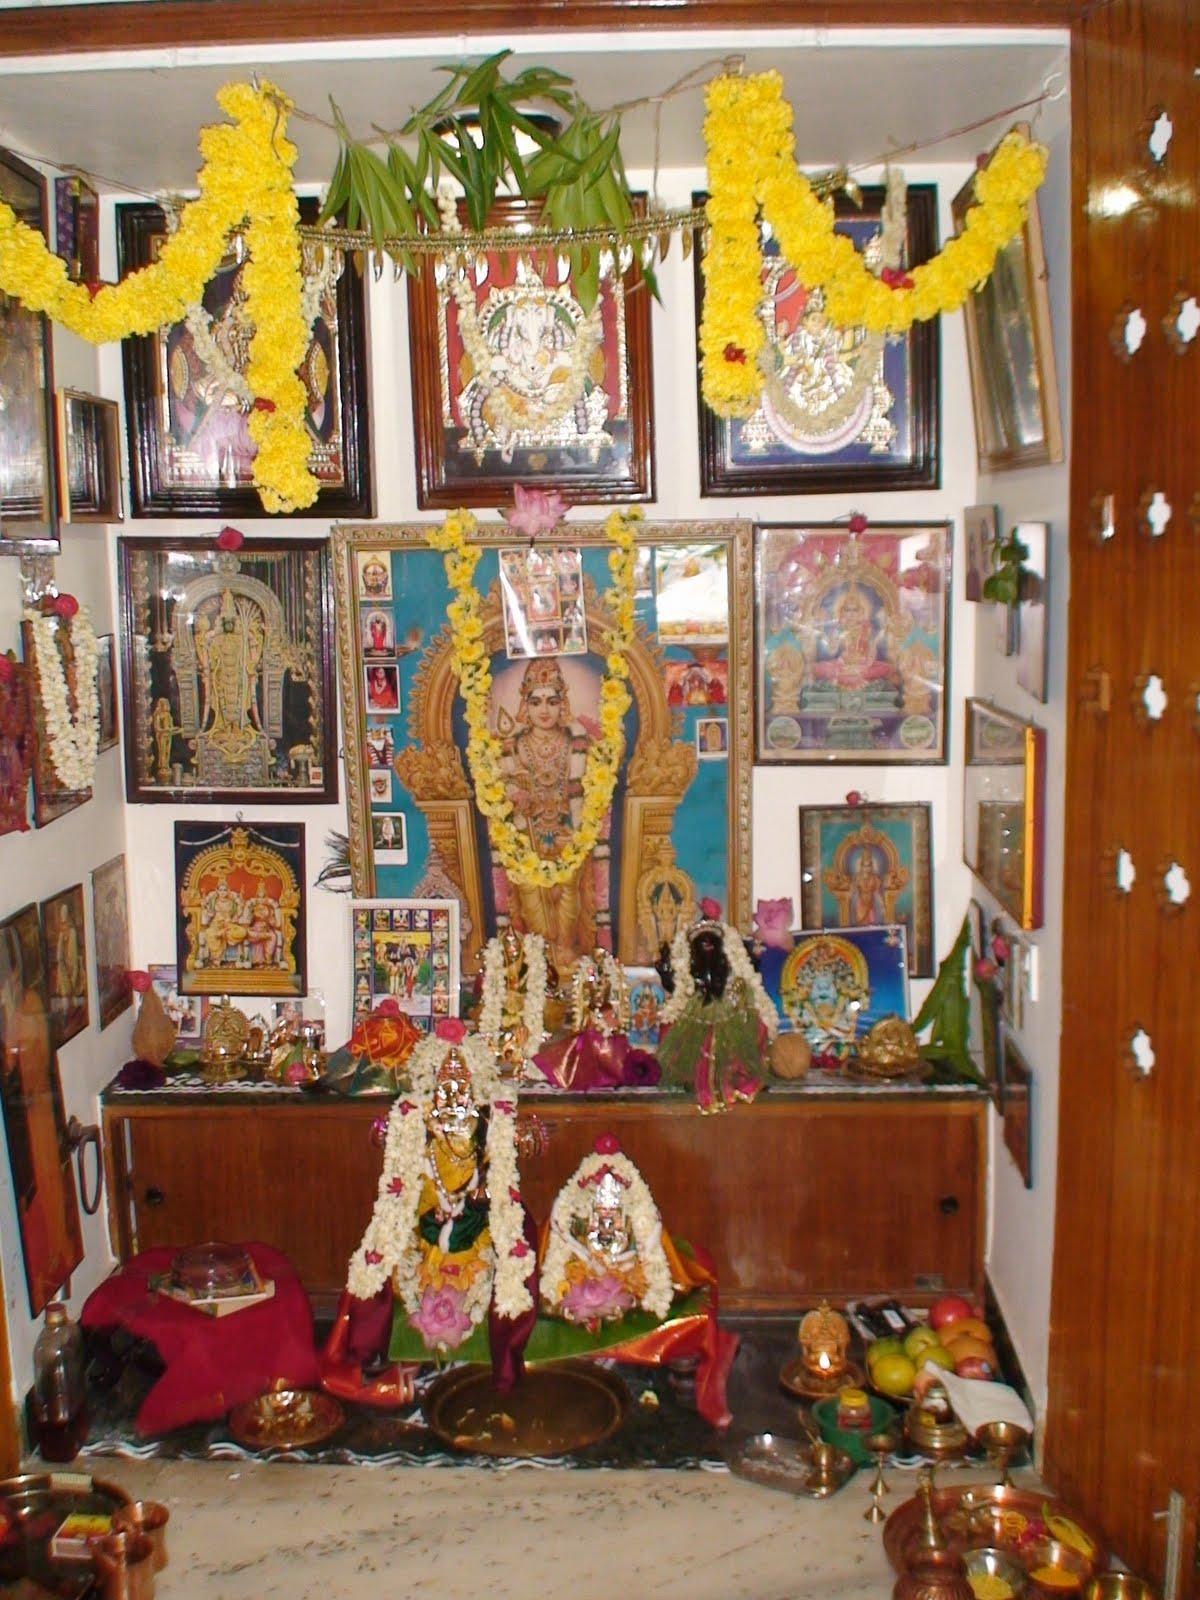 Hindu Prayer Room Design Ideas: Legacy Of Wisdom: Why Do We Have A Prayer Room?